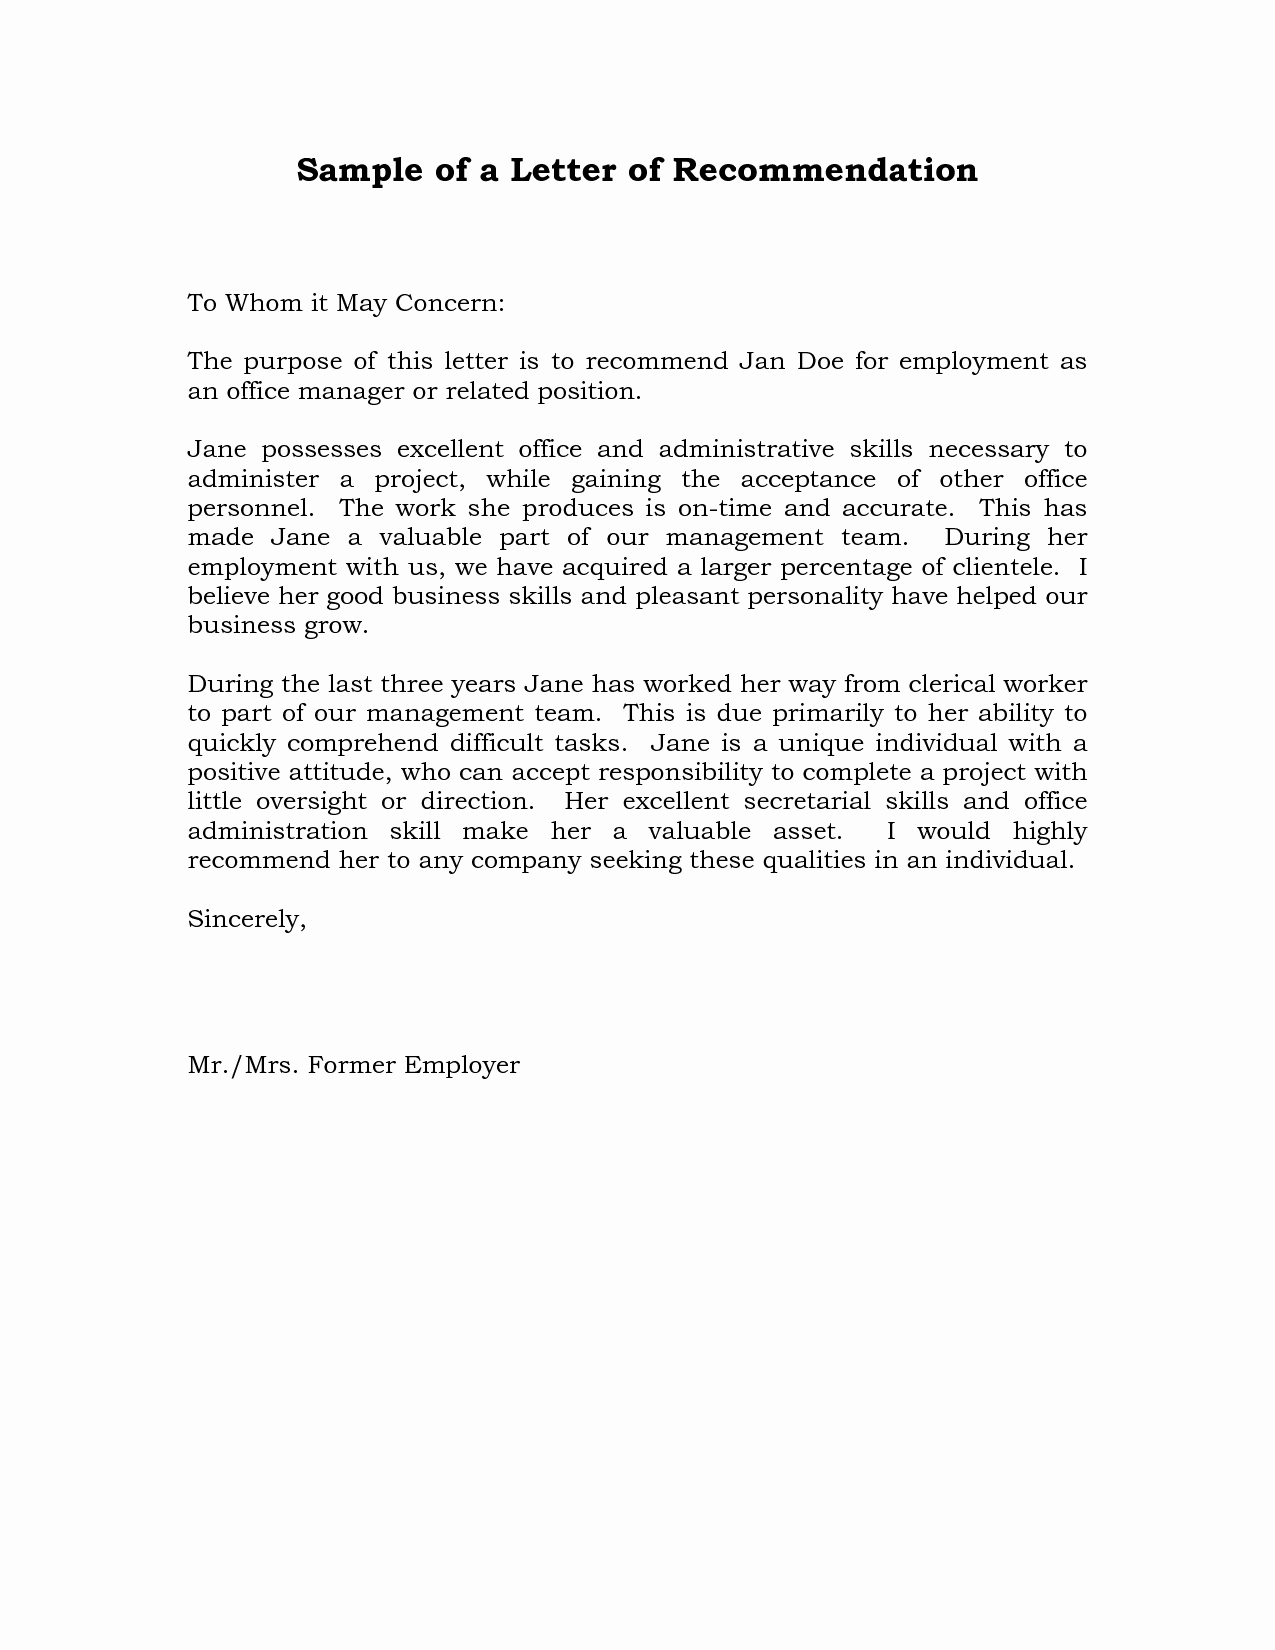 Format Of A Recomendation Letter New Sample Re Mendation Letter for Job